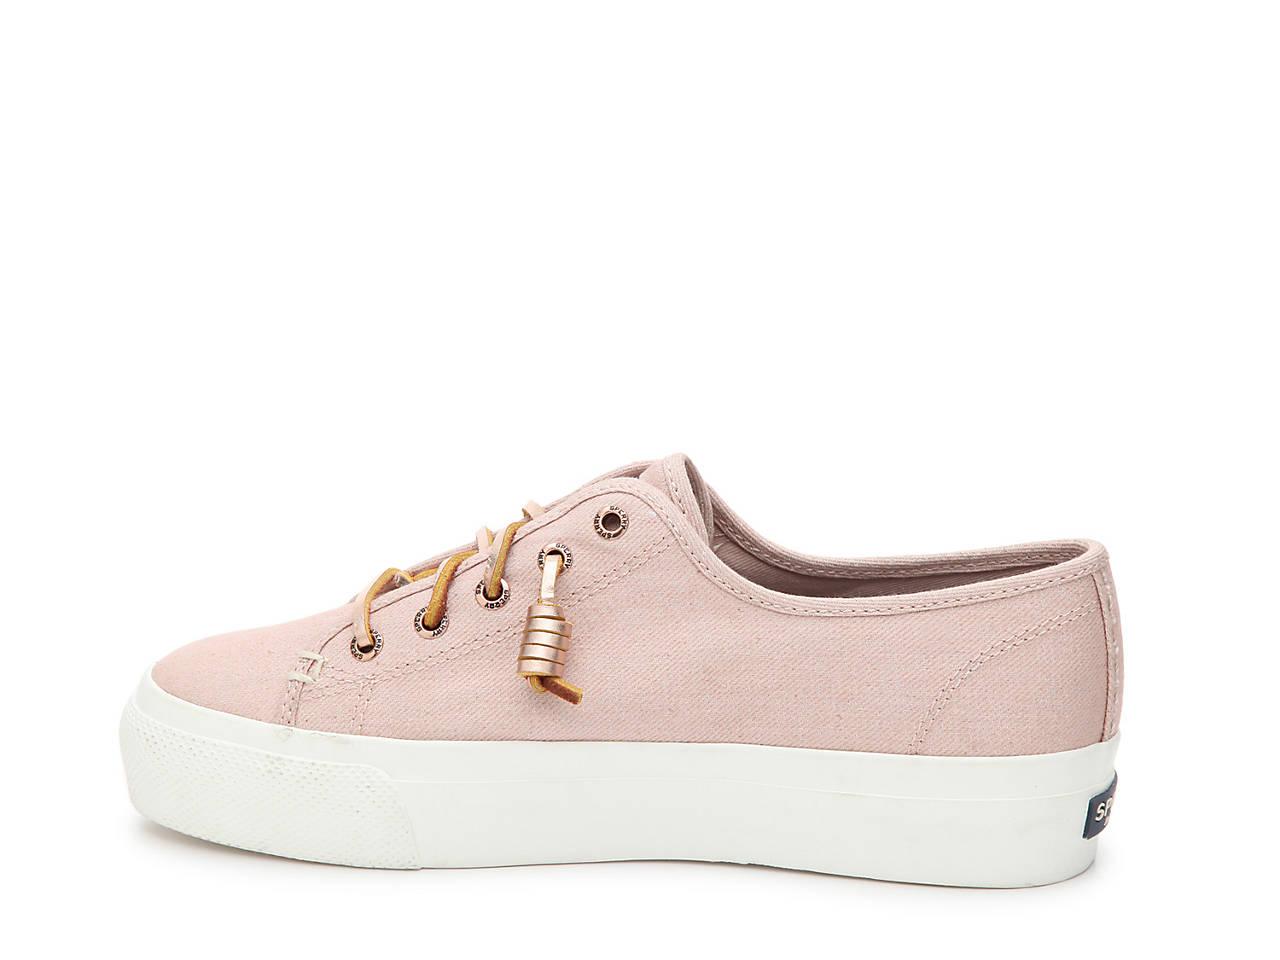 322b71e8d334 Sperry Top-Sider Sky Sail Platform Slip-On Sneaker Women s Shoes